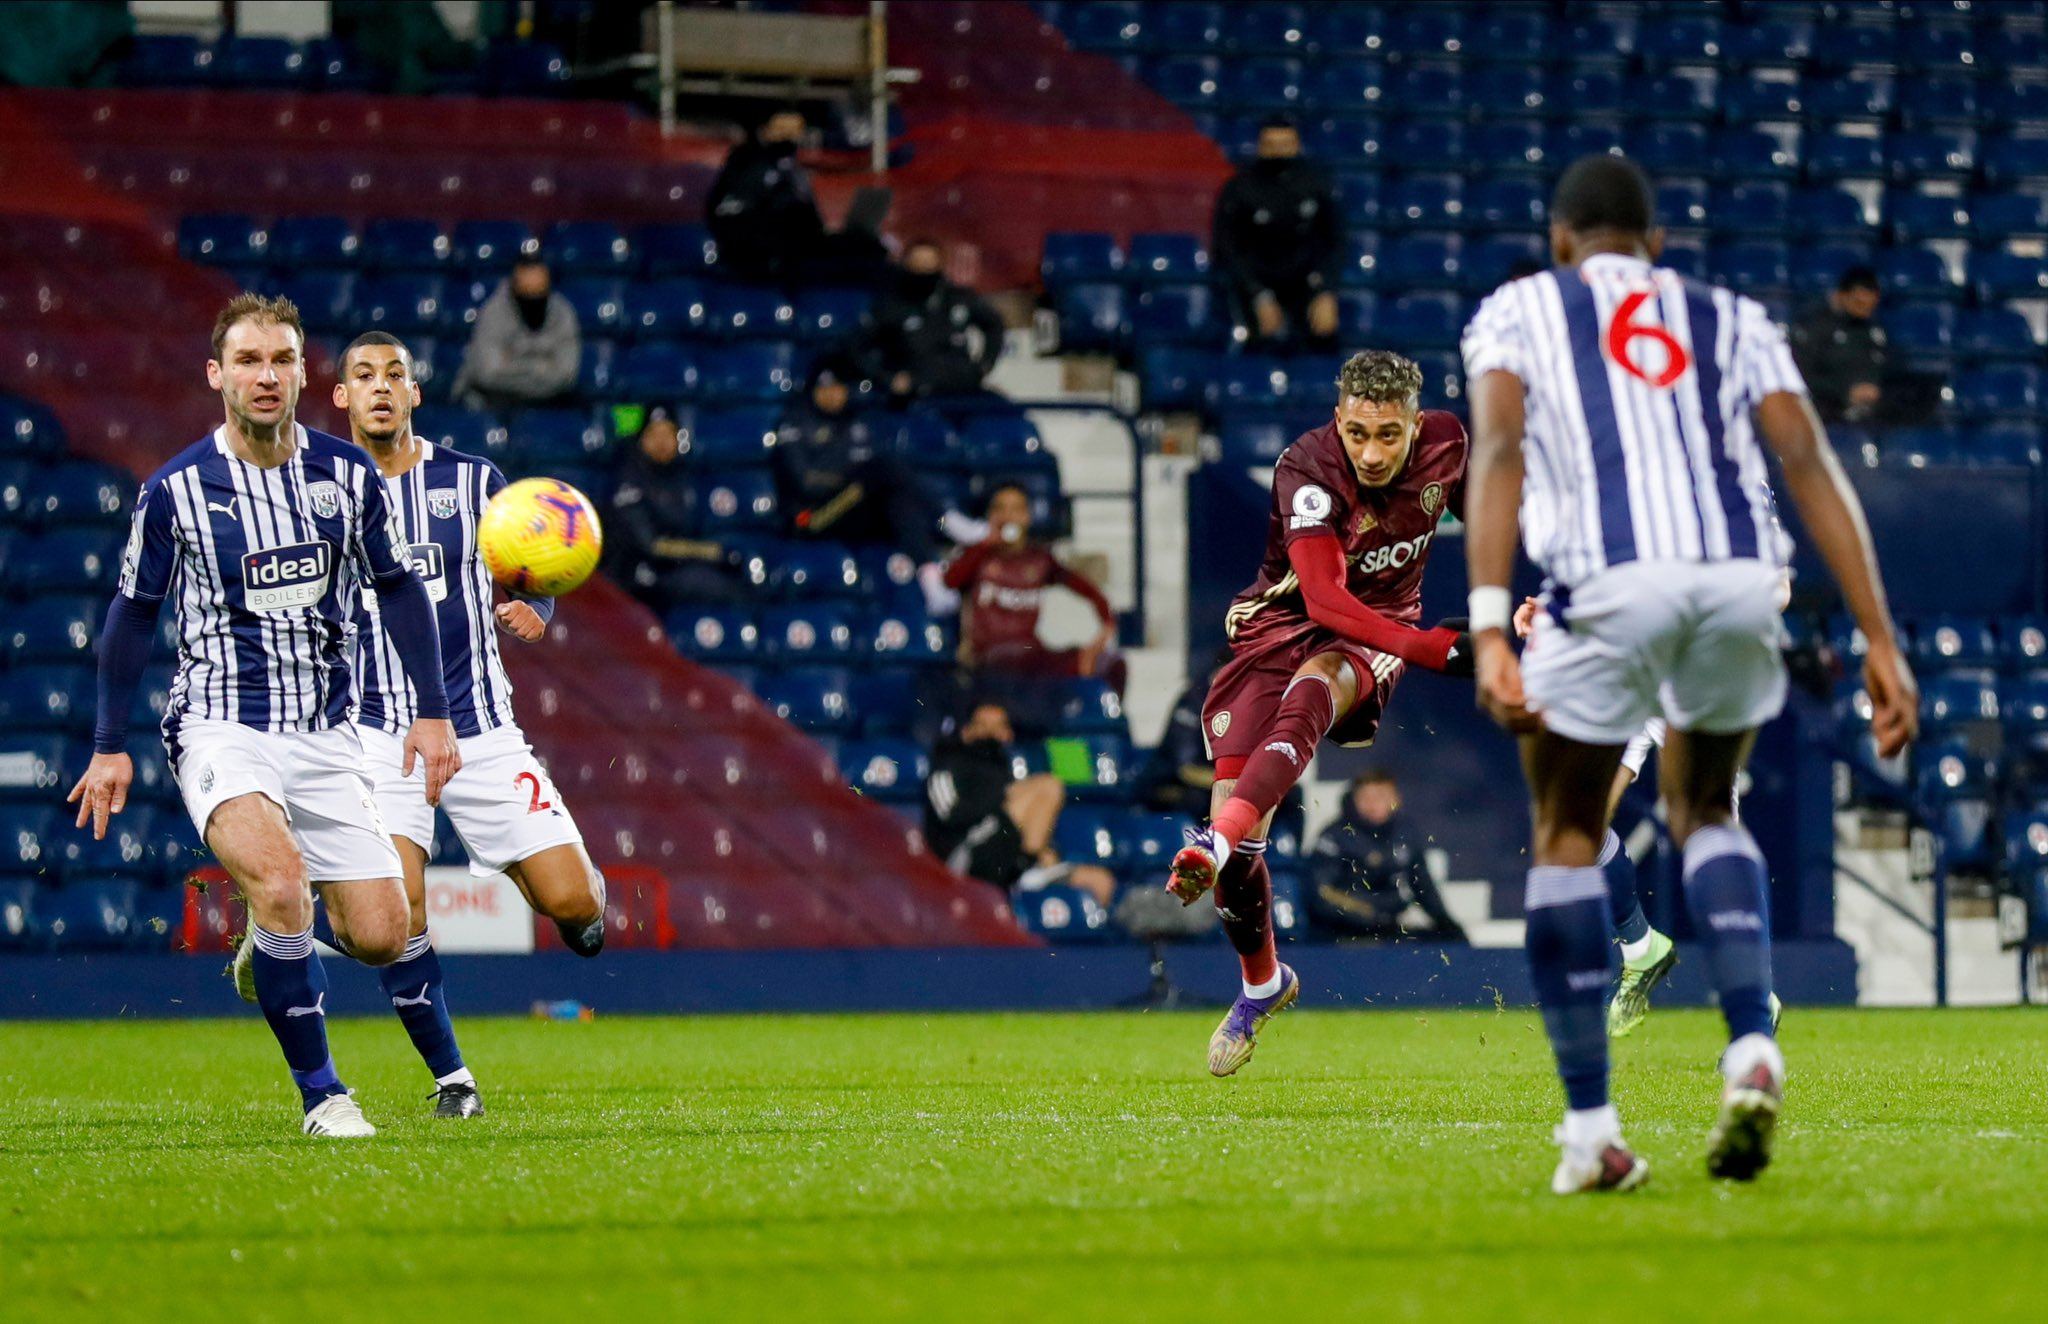 Leeds United against West Brom [PHOTO CREDIT: @LUFC]